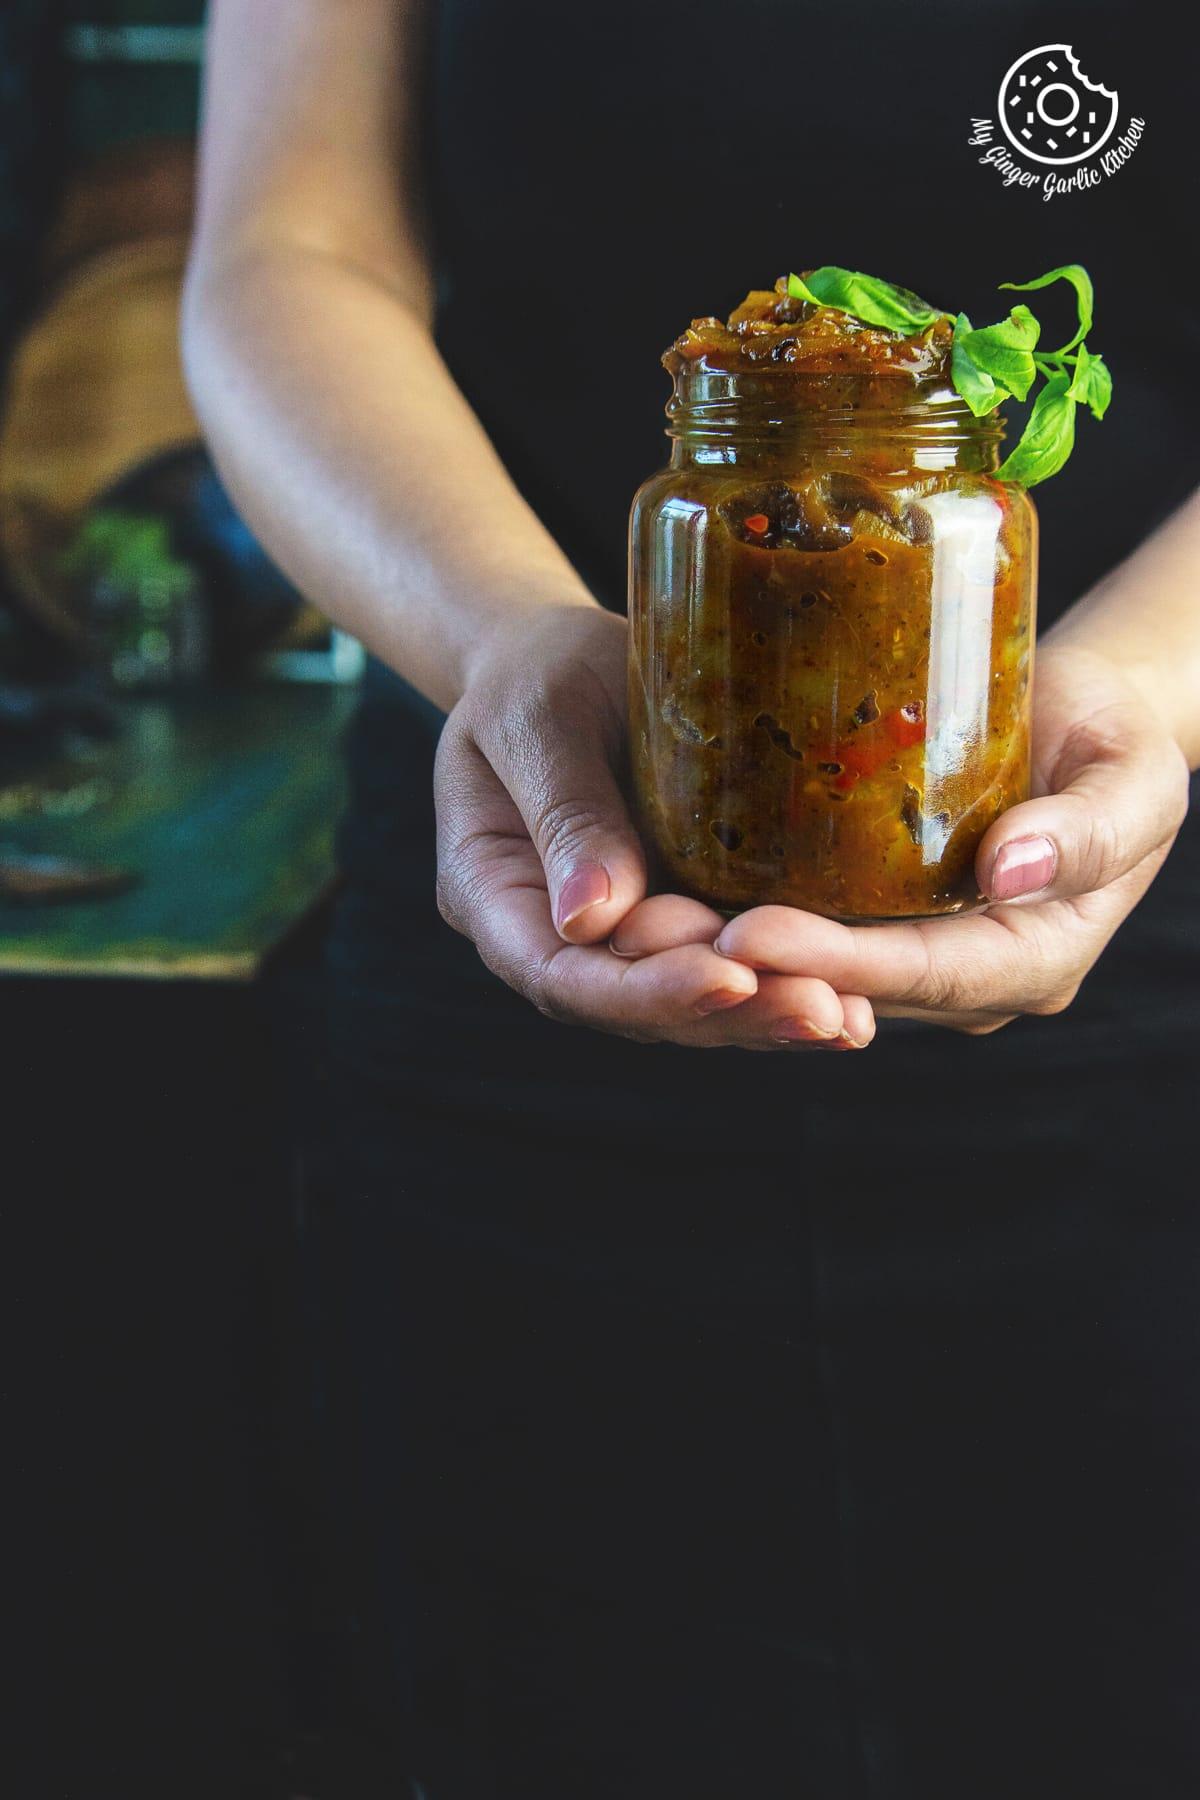 a female is holding peach chutney jar